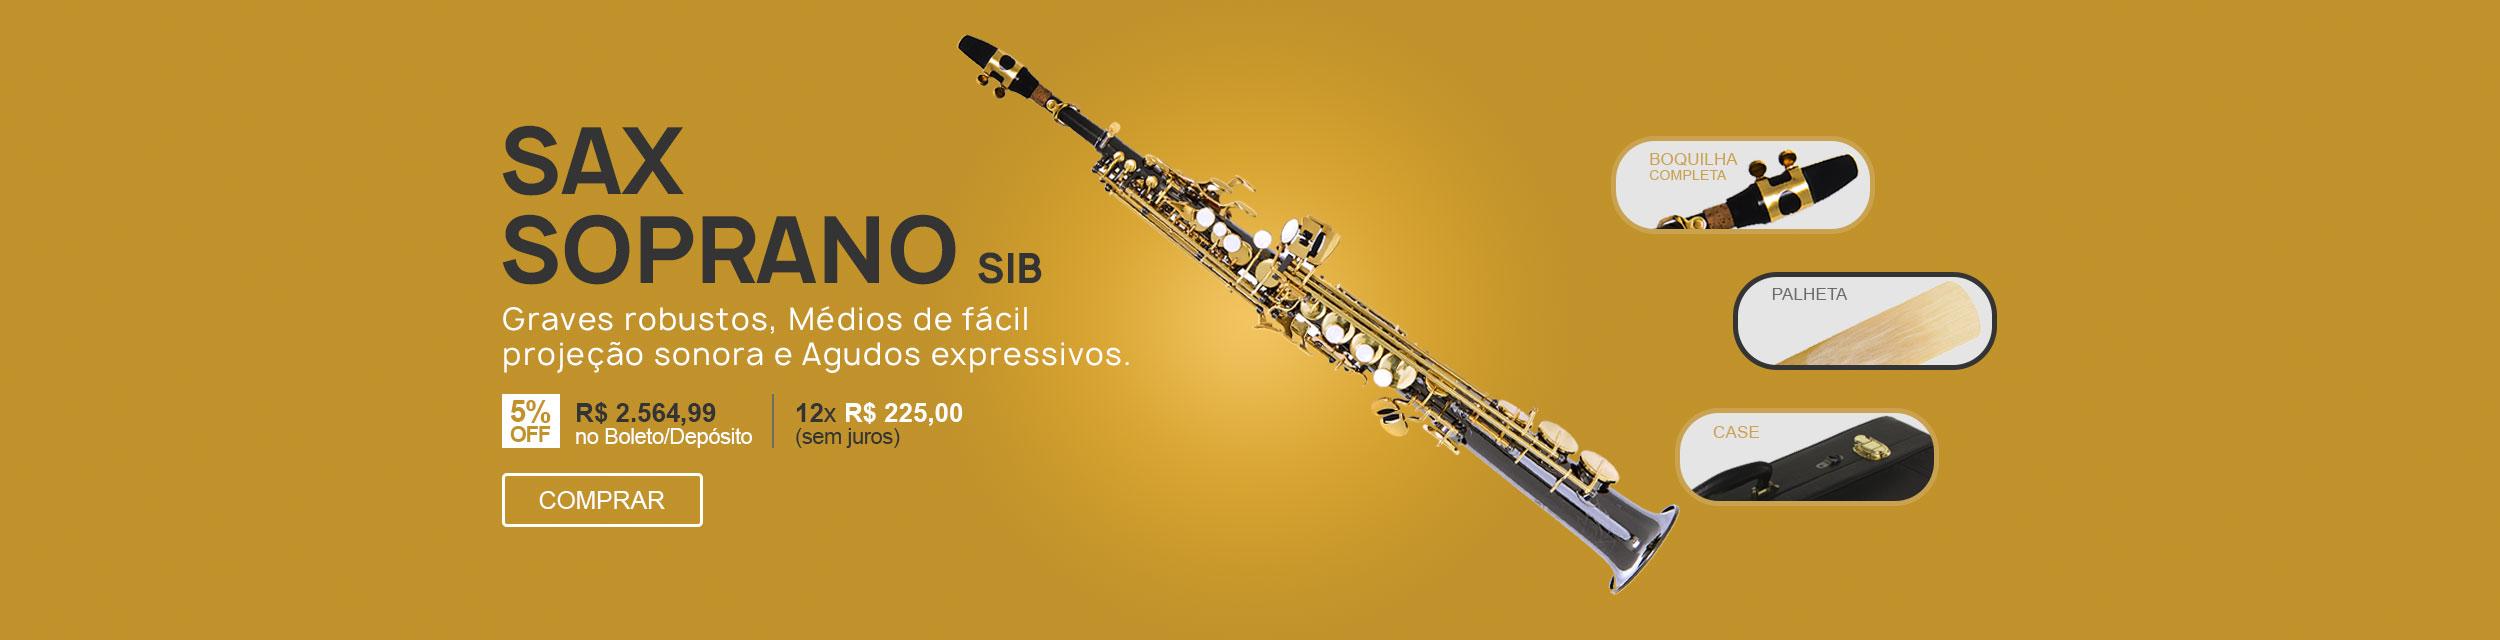 F - Sax Soprano Sib - Graves, Médios e Agudos.